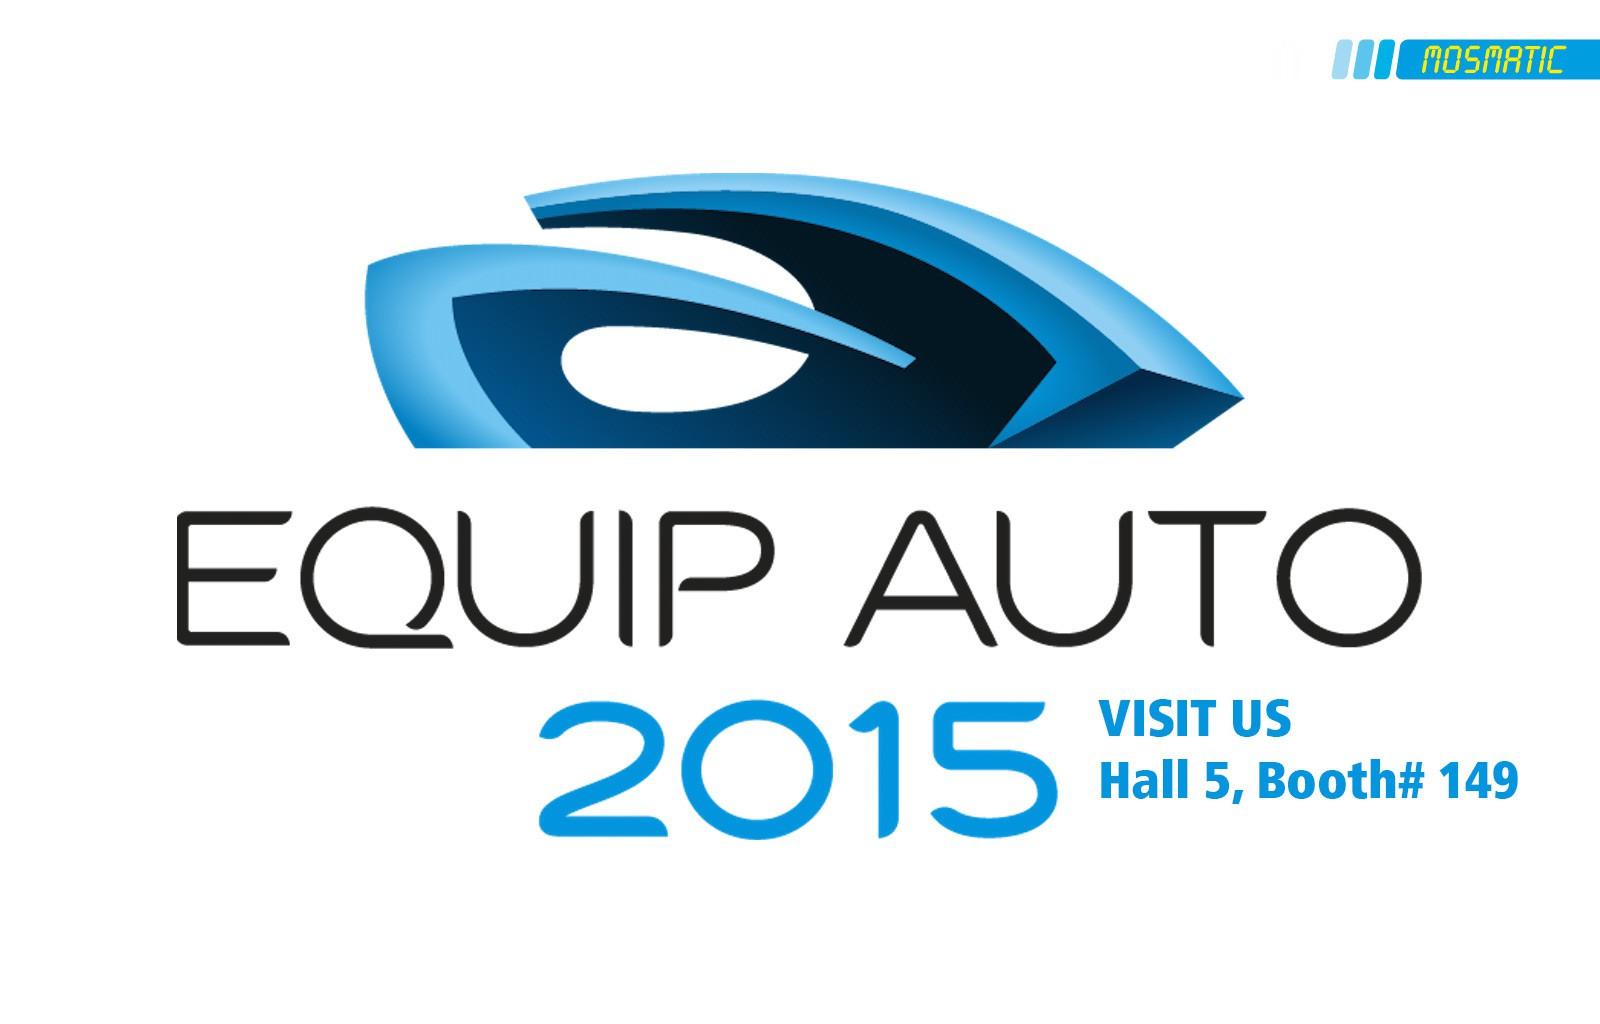 Mosmatic Equip Auto 2015